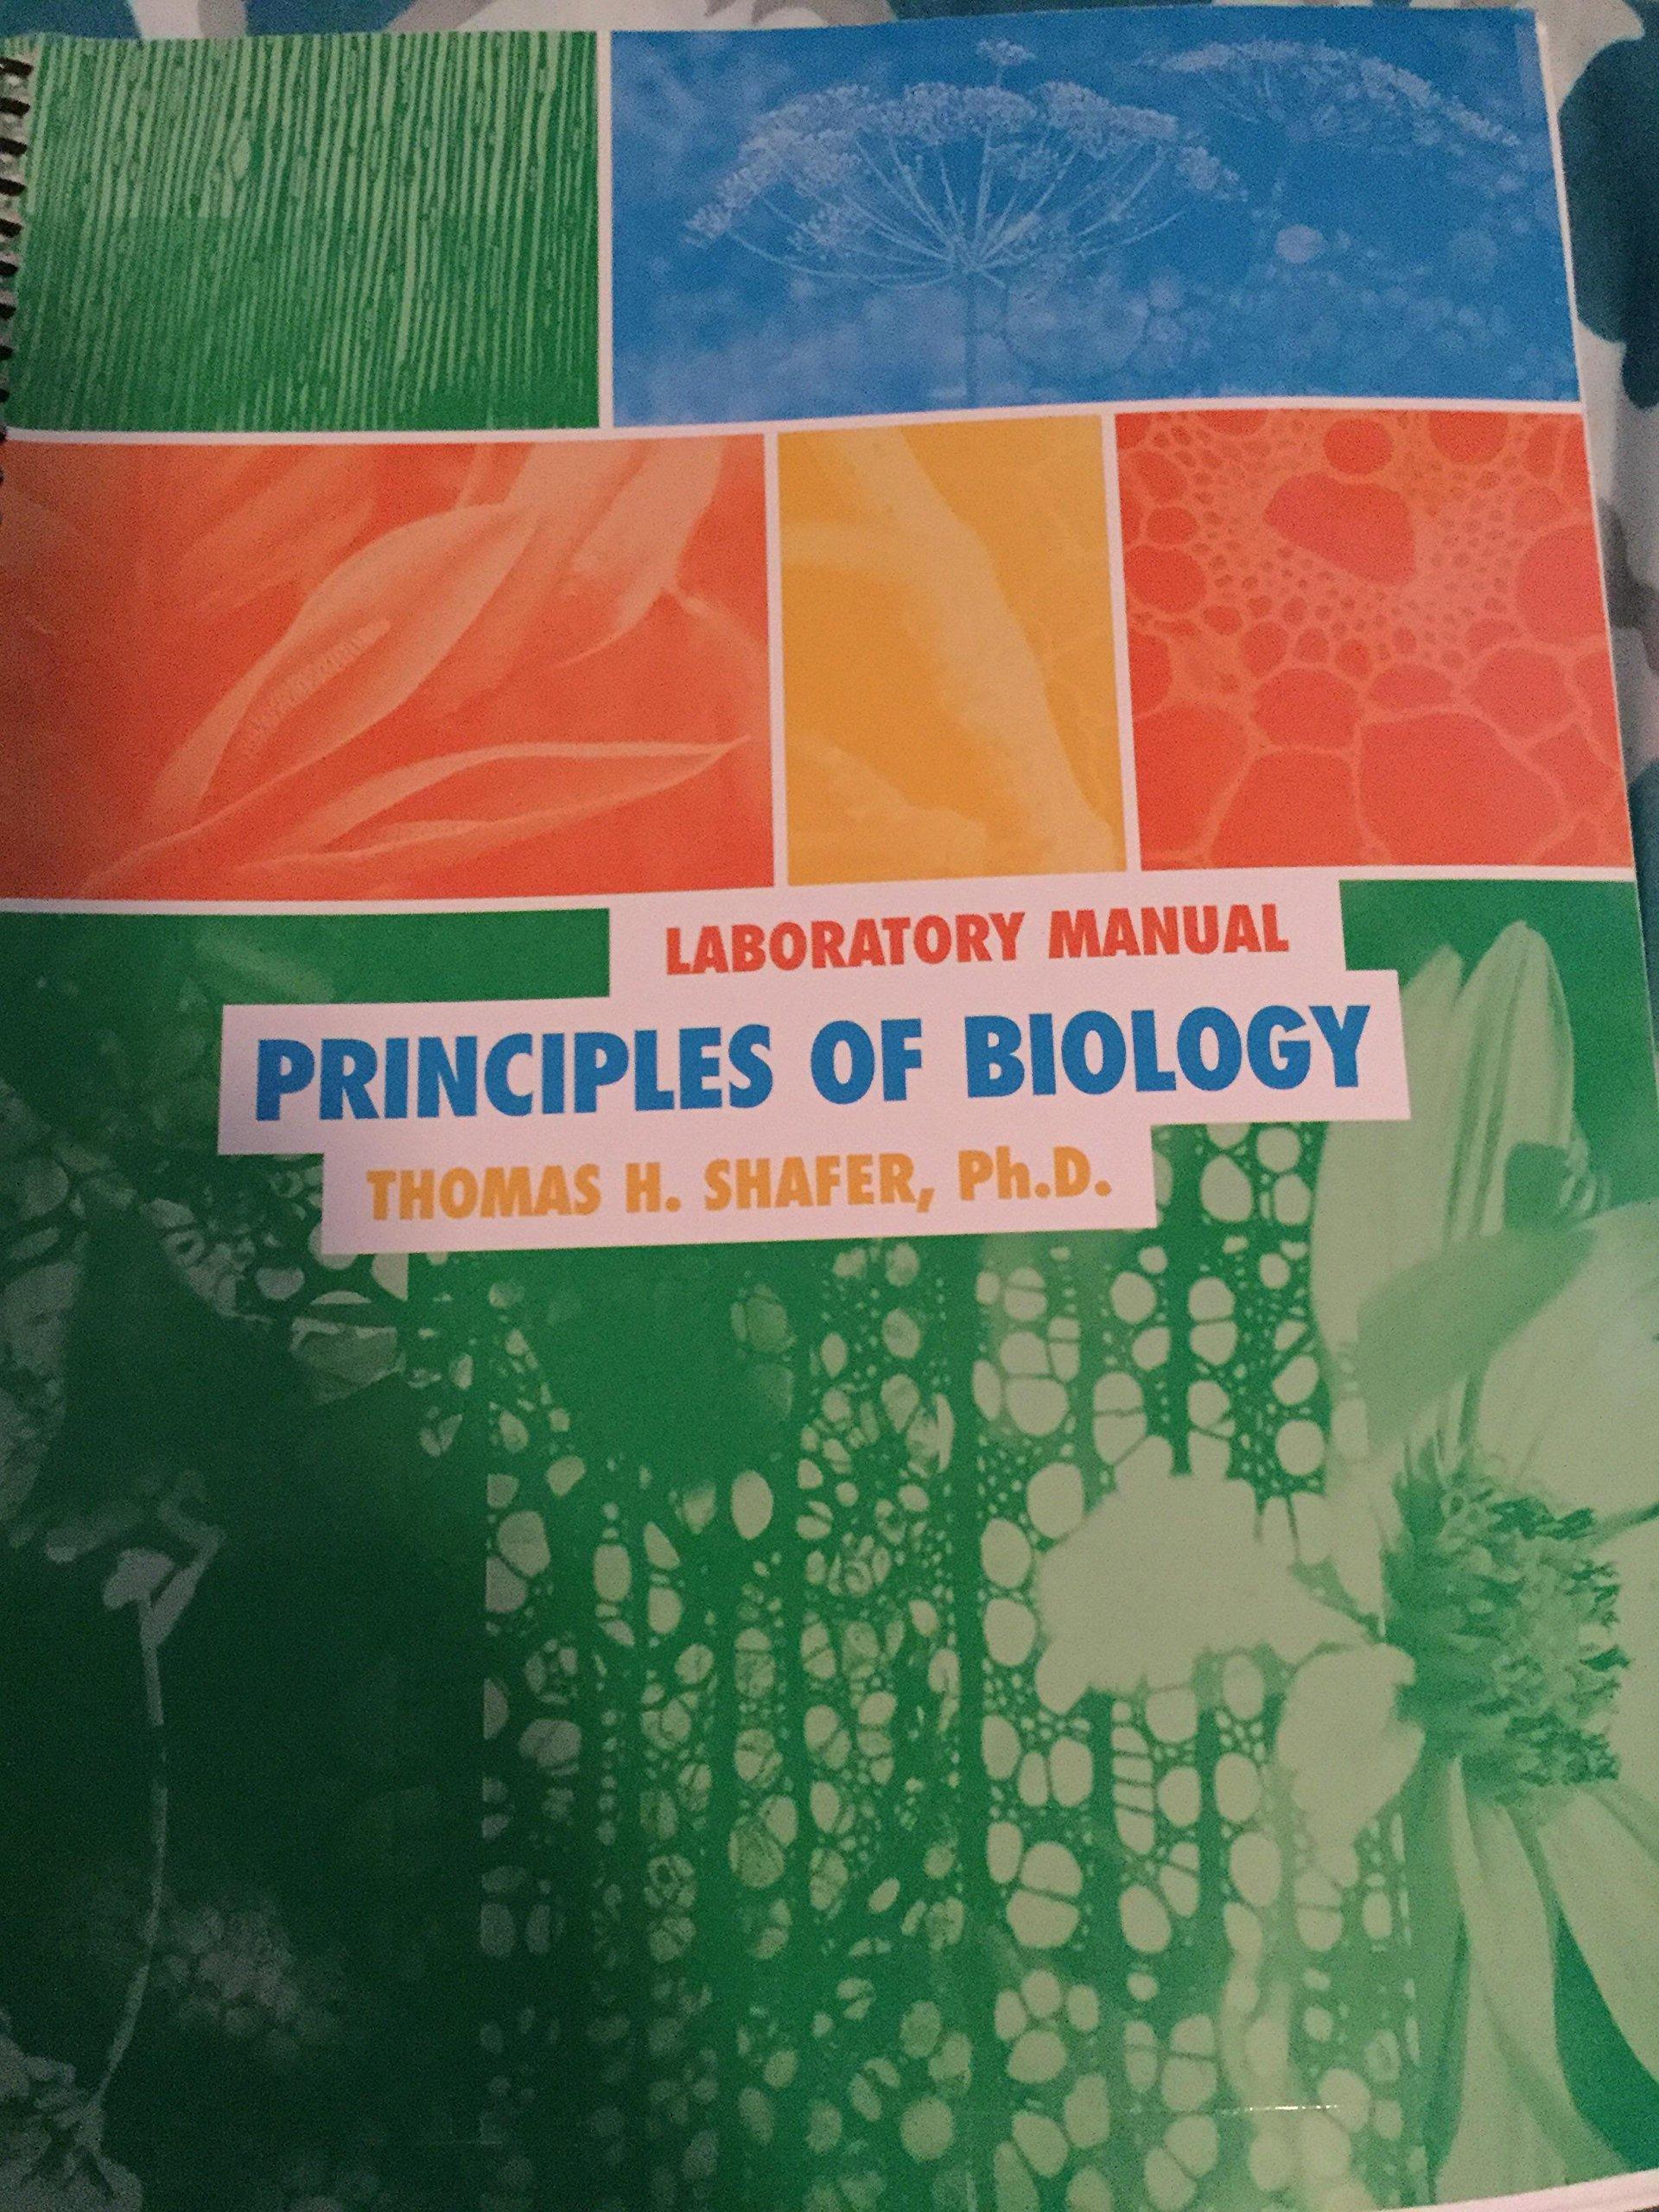 Principles of Biology Laboratory Manual Pearson Custom Edition: Thomas H  Shafer: 9780536749758: Amazon.com: Books